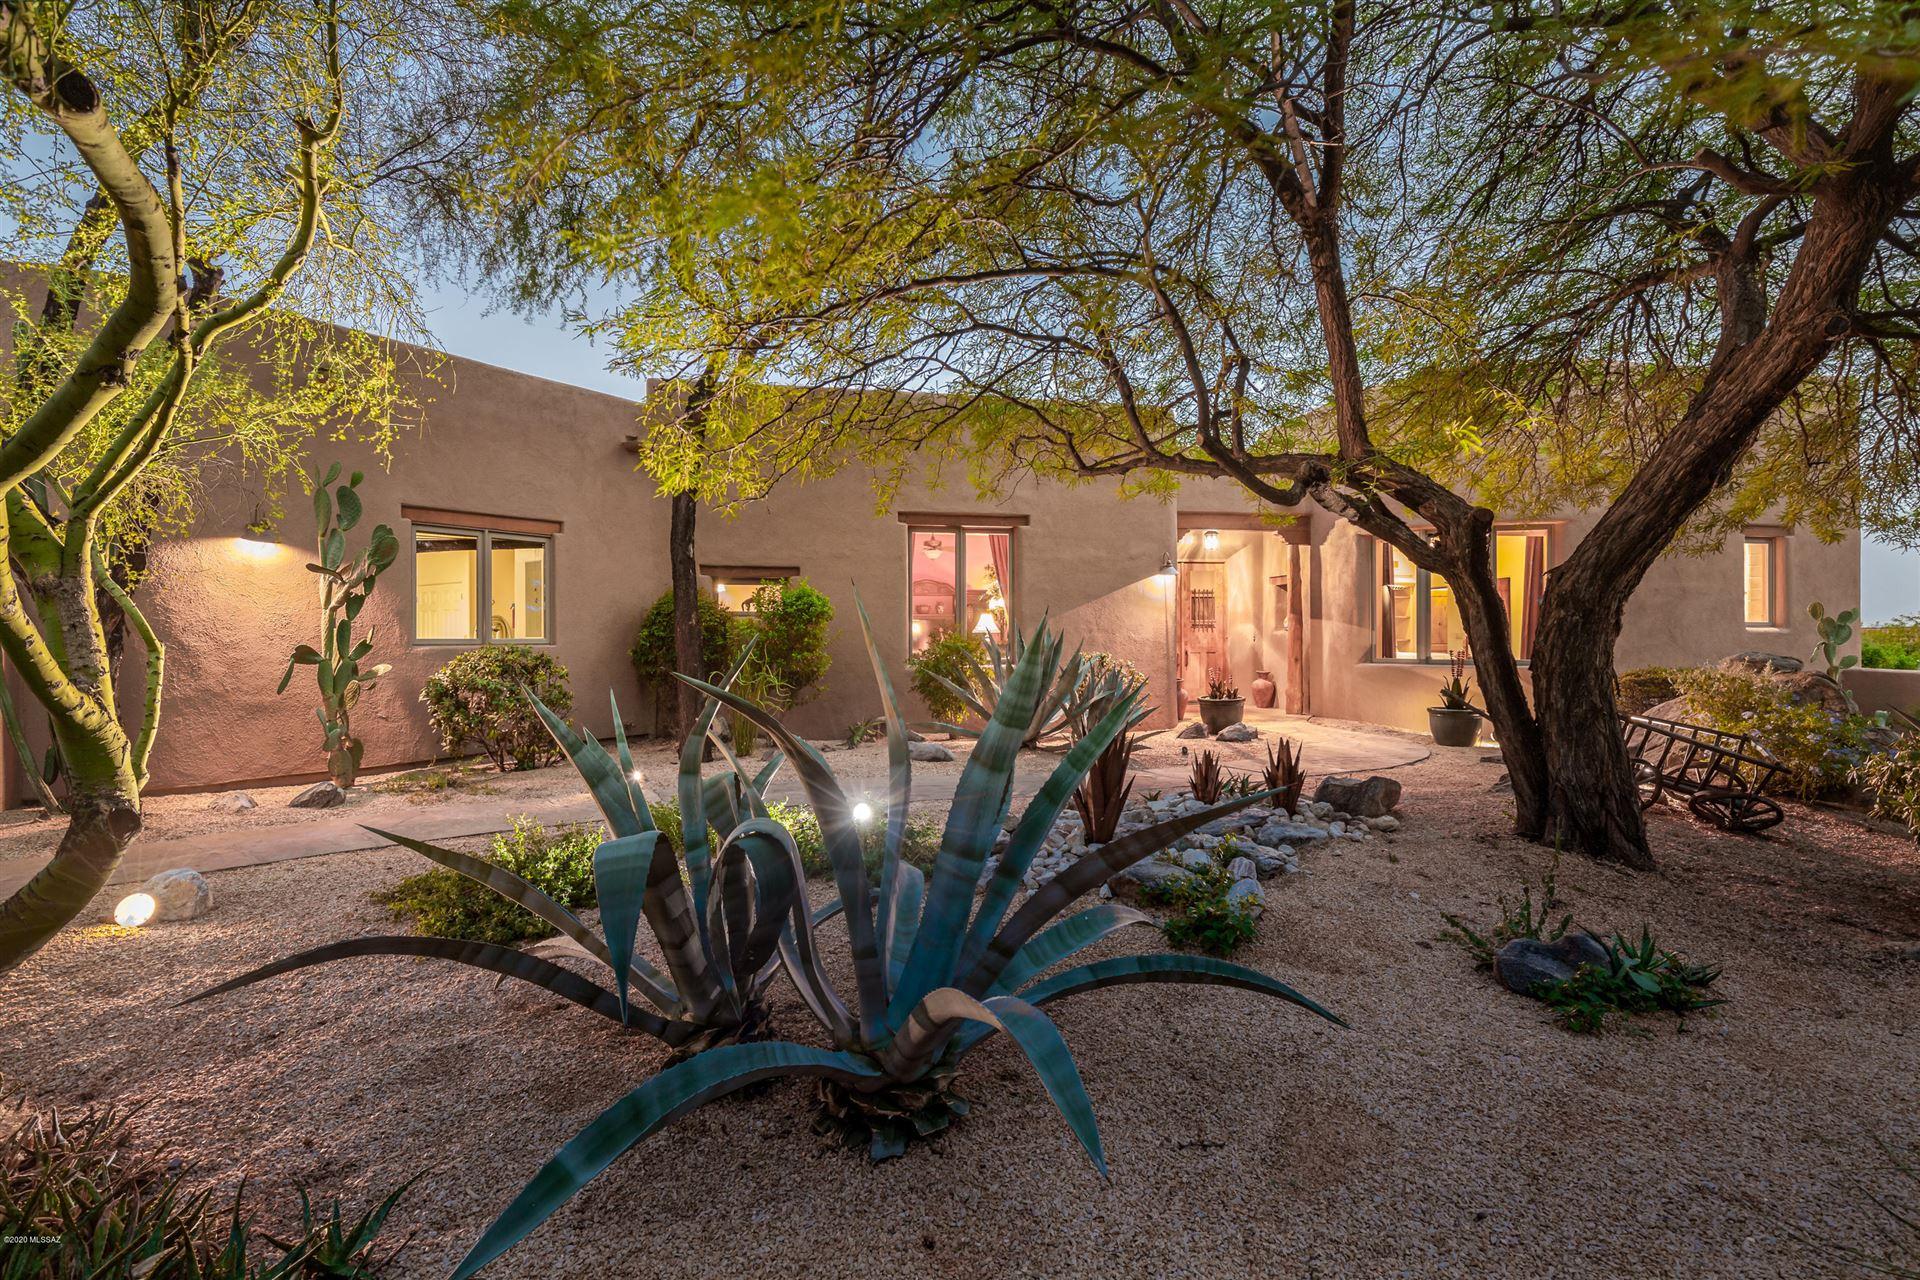 580 E Crescent Moon Drive, Oro Valley, AZ 85755 - MLS#: 22022970